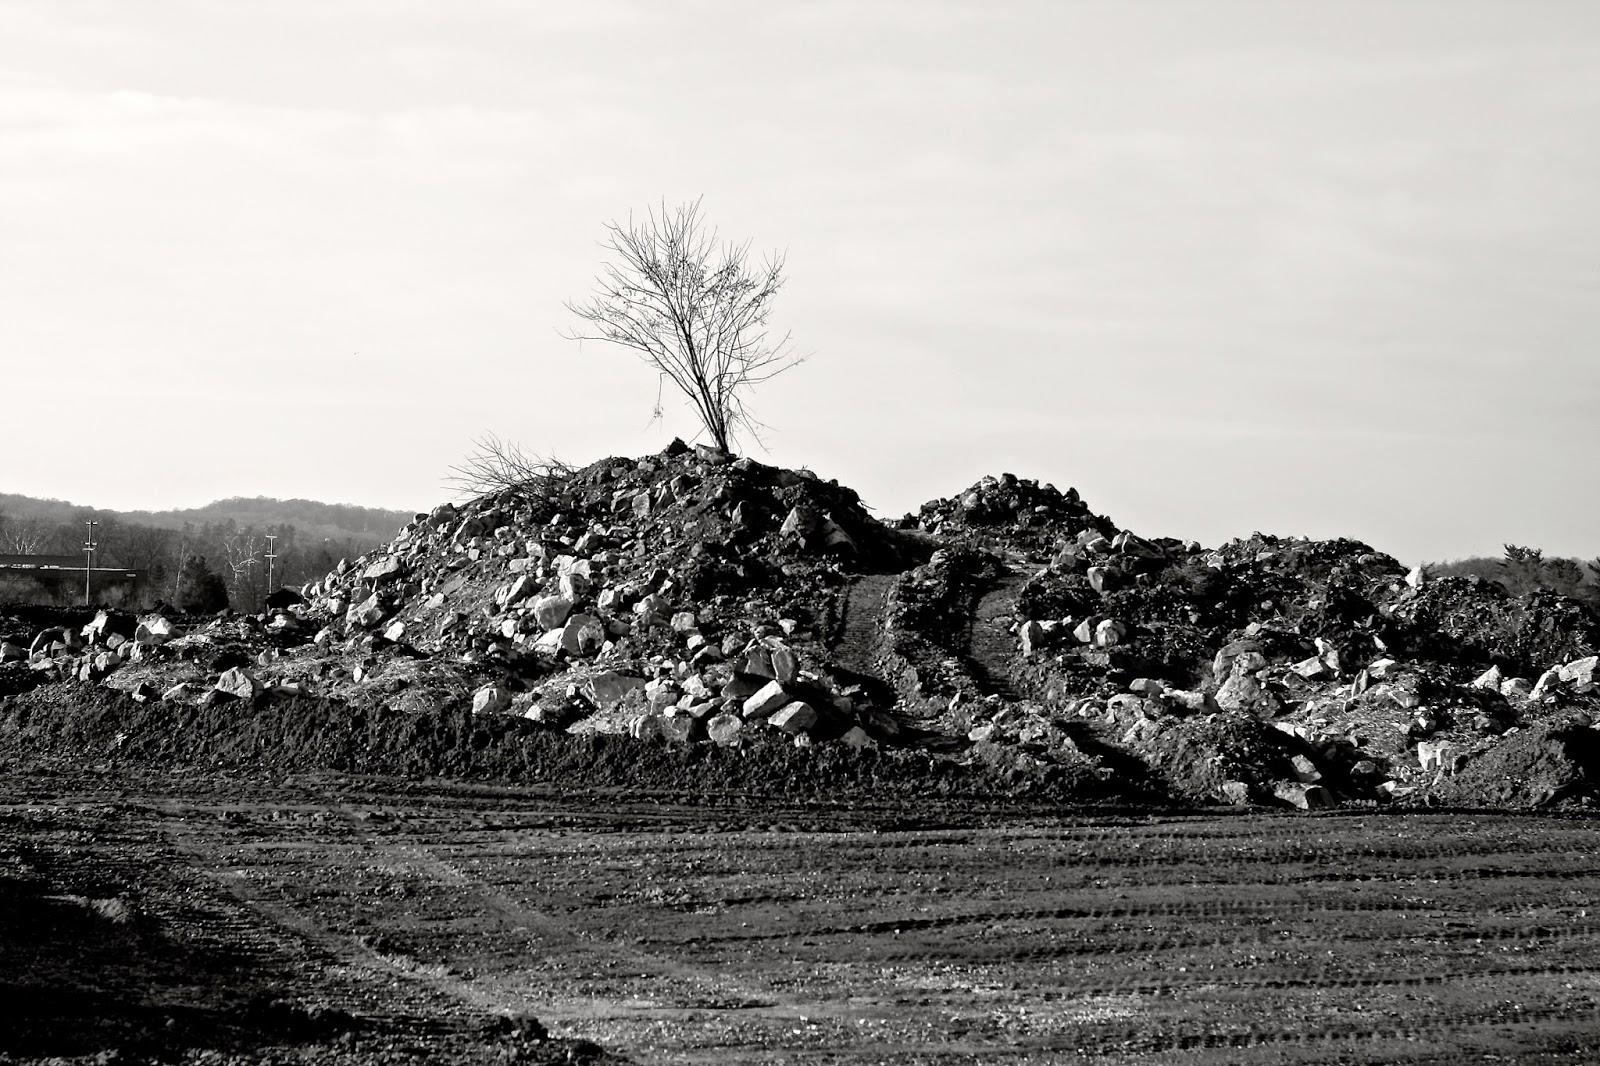 tree constructin site